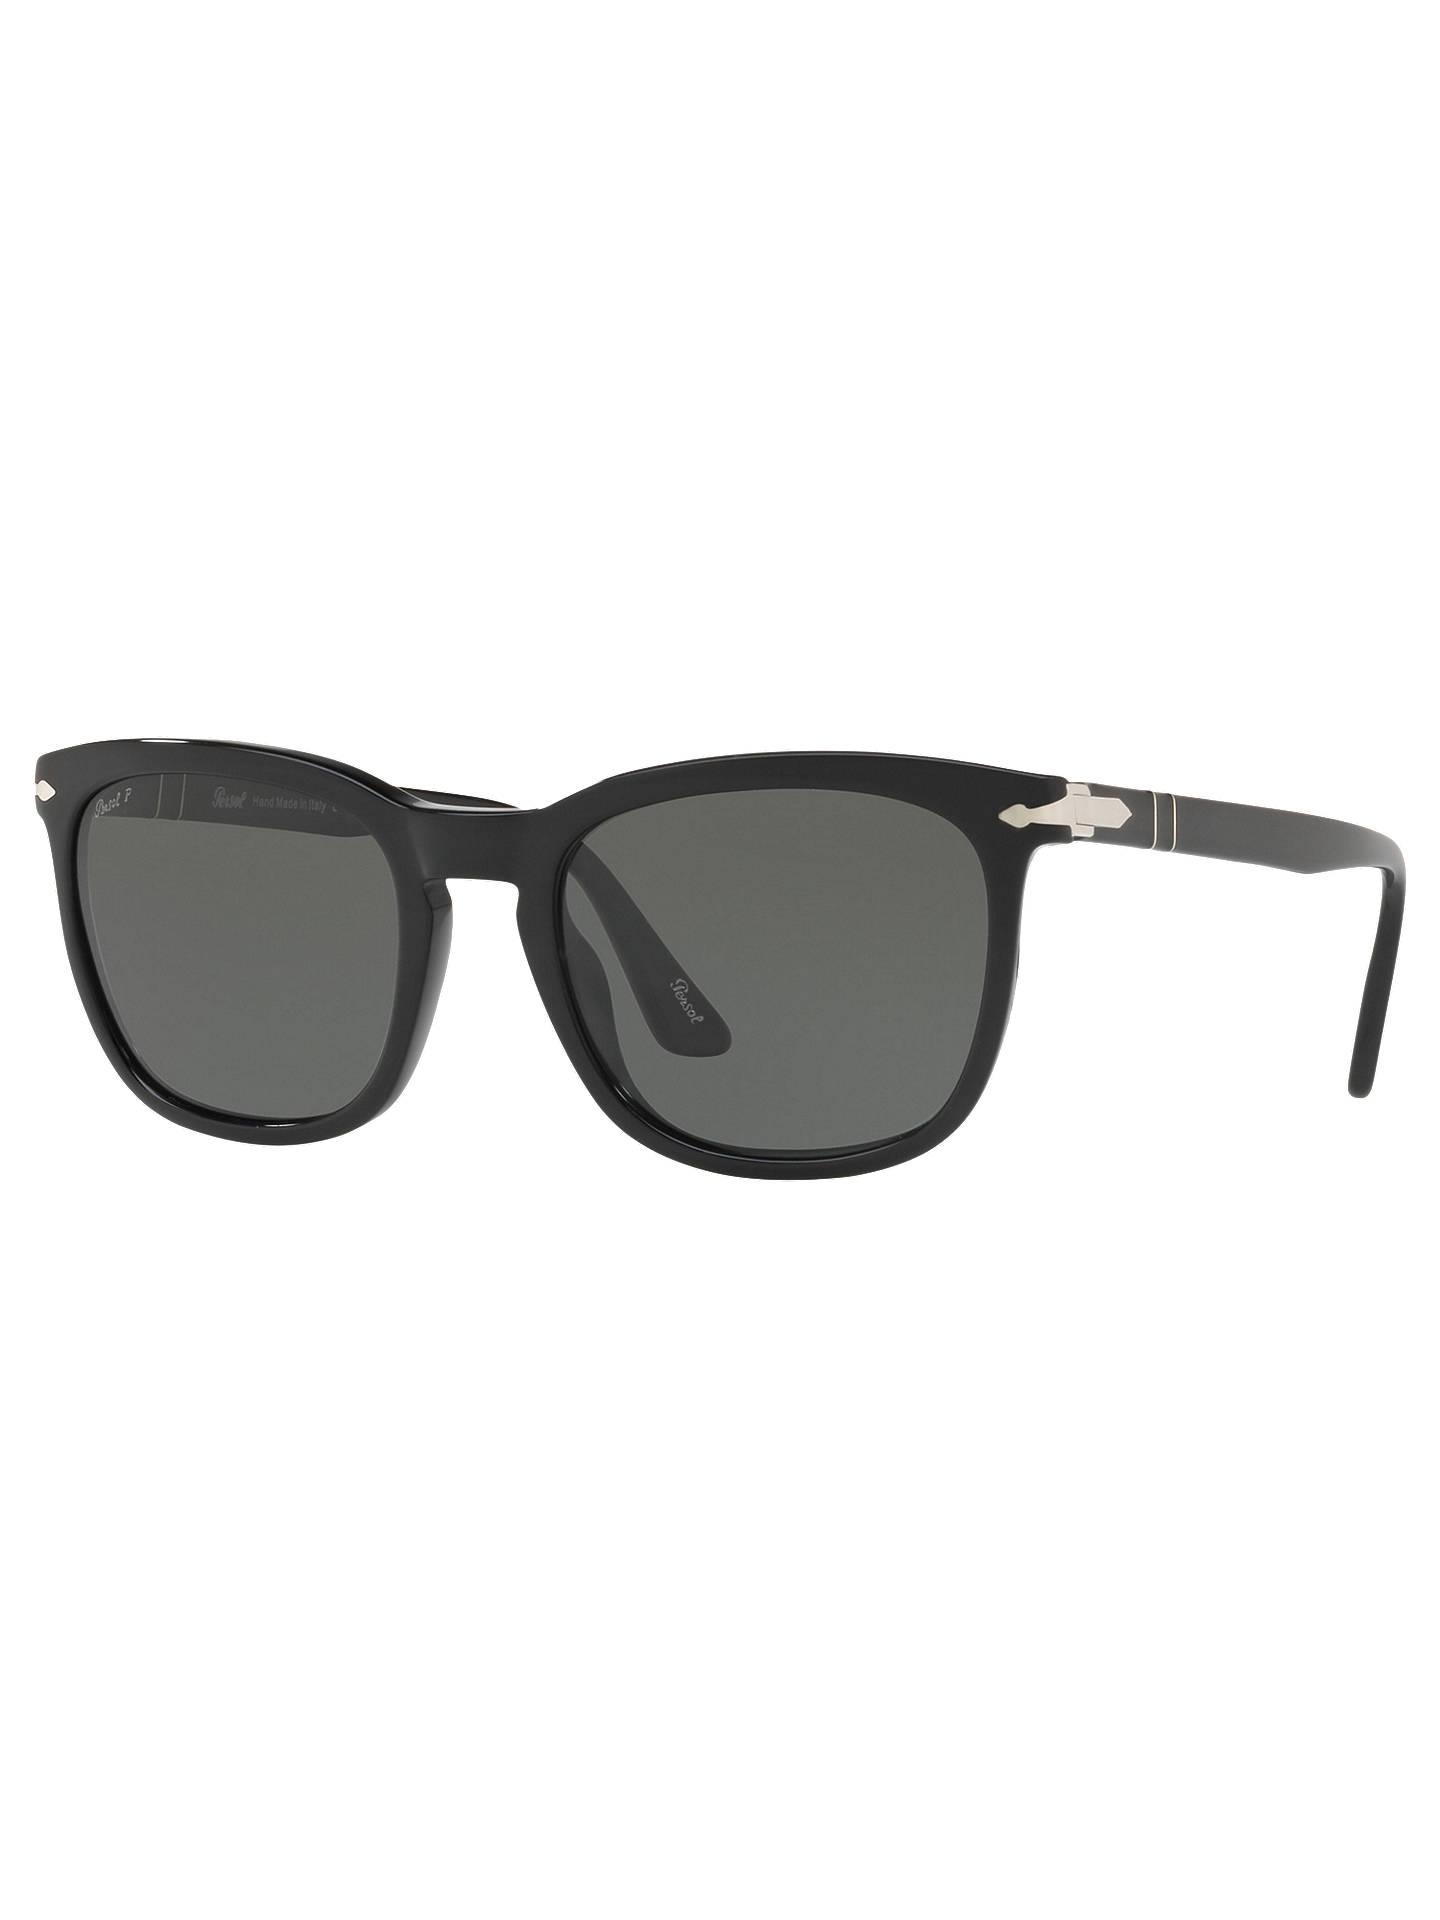 3240801ec33 Persol PO3193S Men s D-Frame Sunglasses at John Lewis   Partners